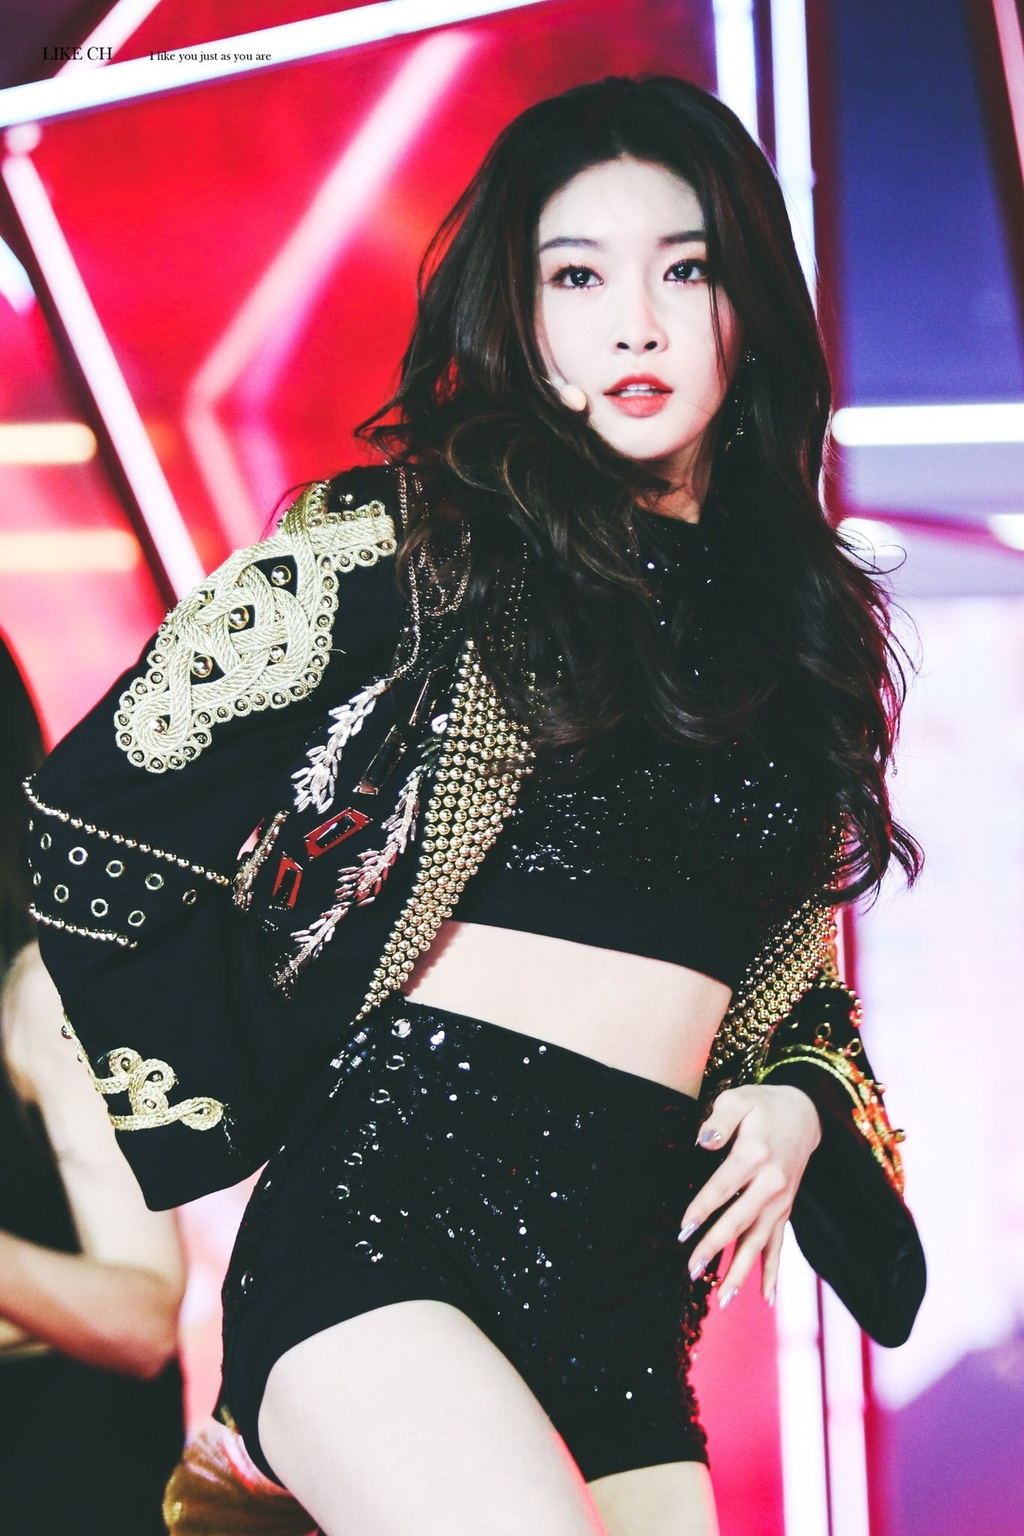 5 idol Kpop so huu hinh tuong girl crush hinh anh 7 chungha_1576291705693493968264.jpeg